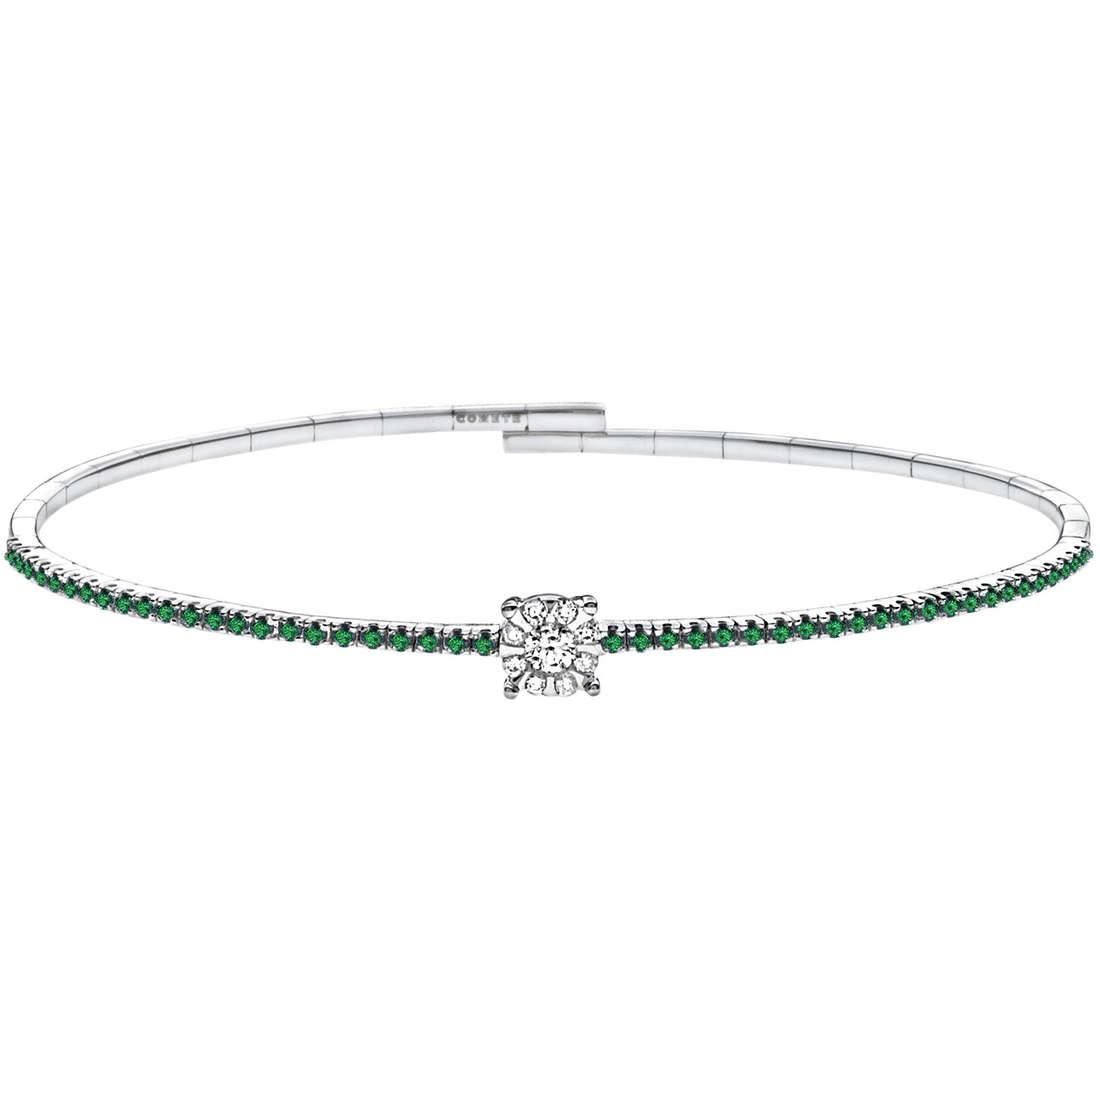 bracelet woman jewellery Comete Pietre preziose colorate BRT 238